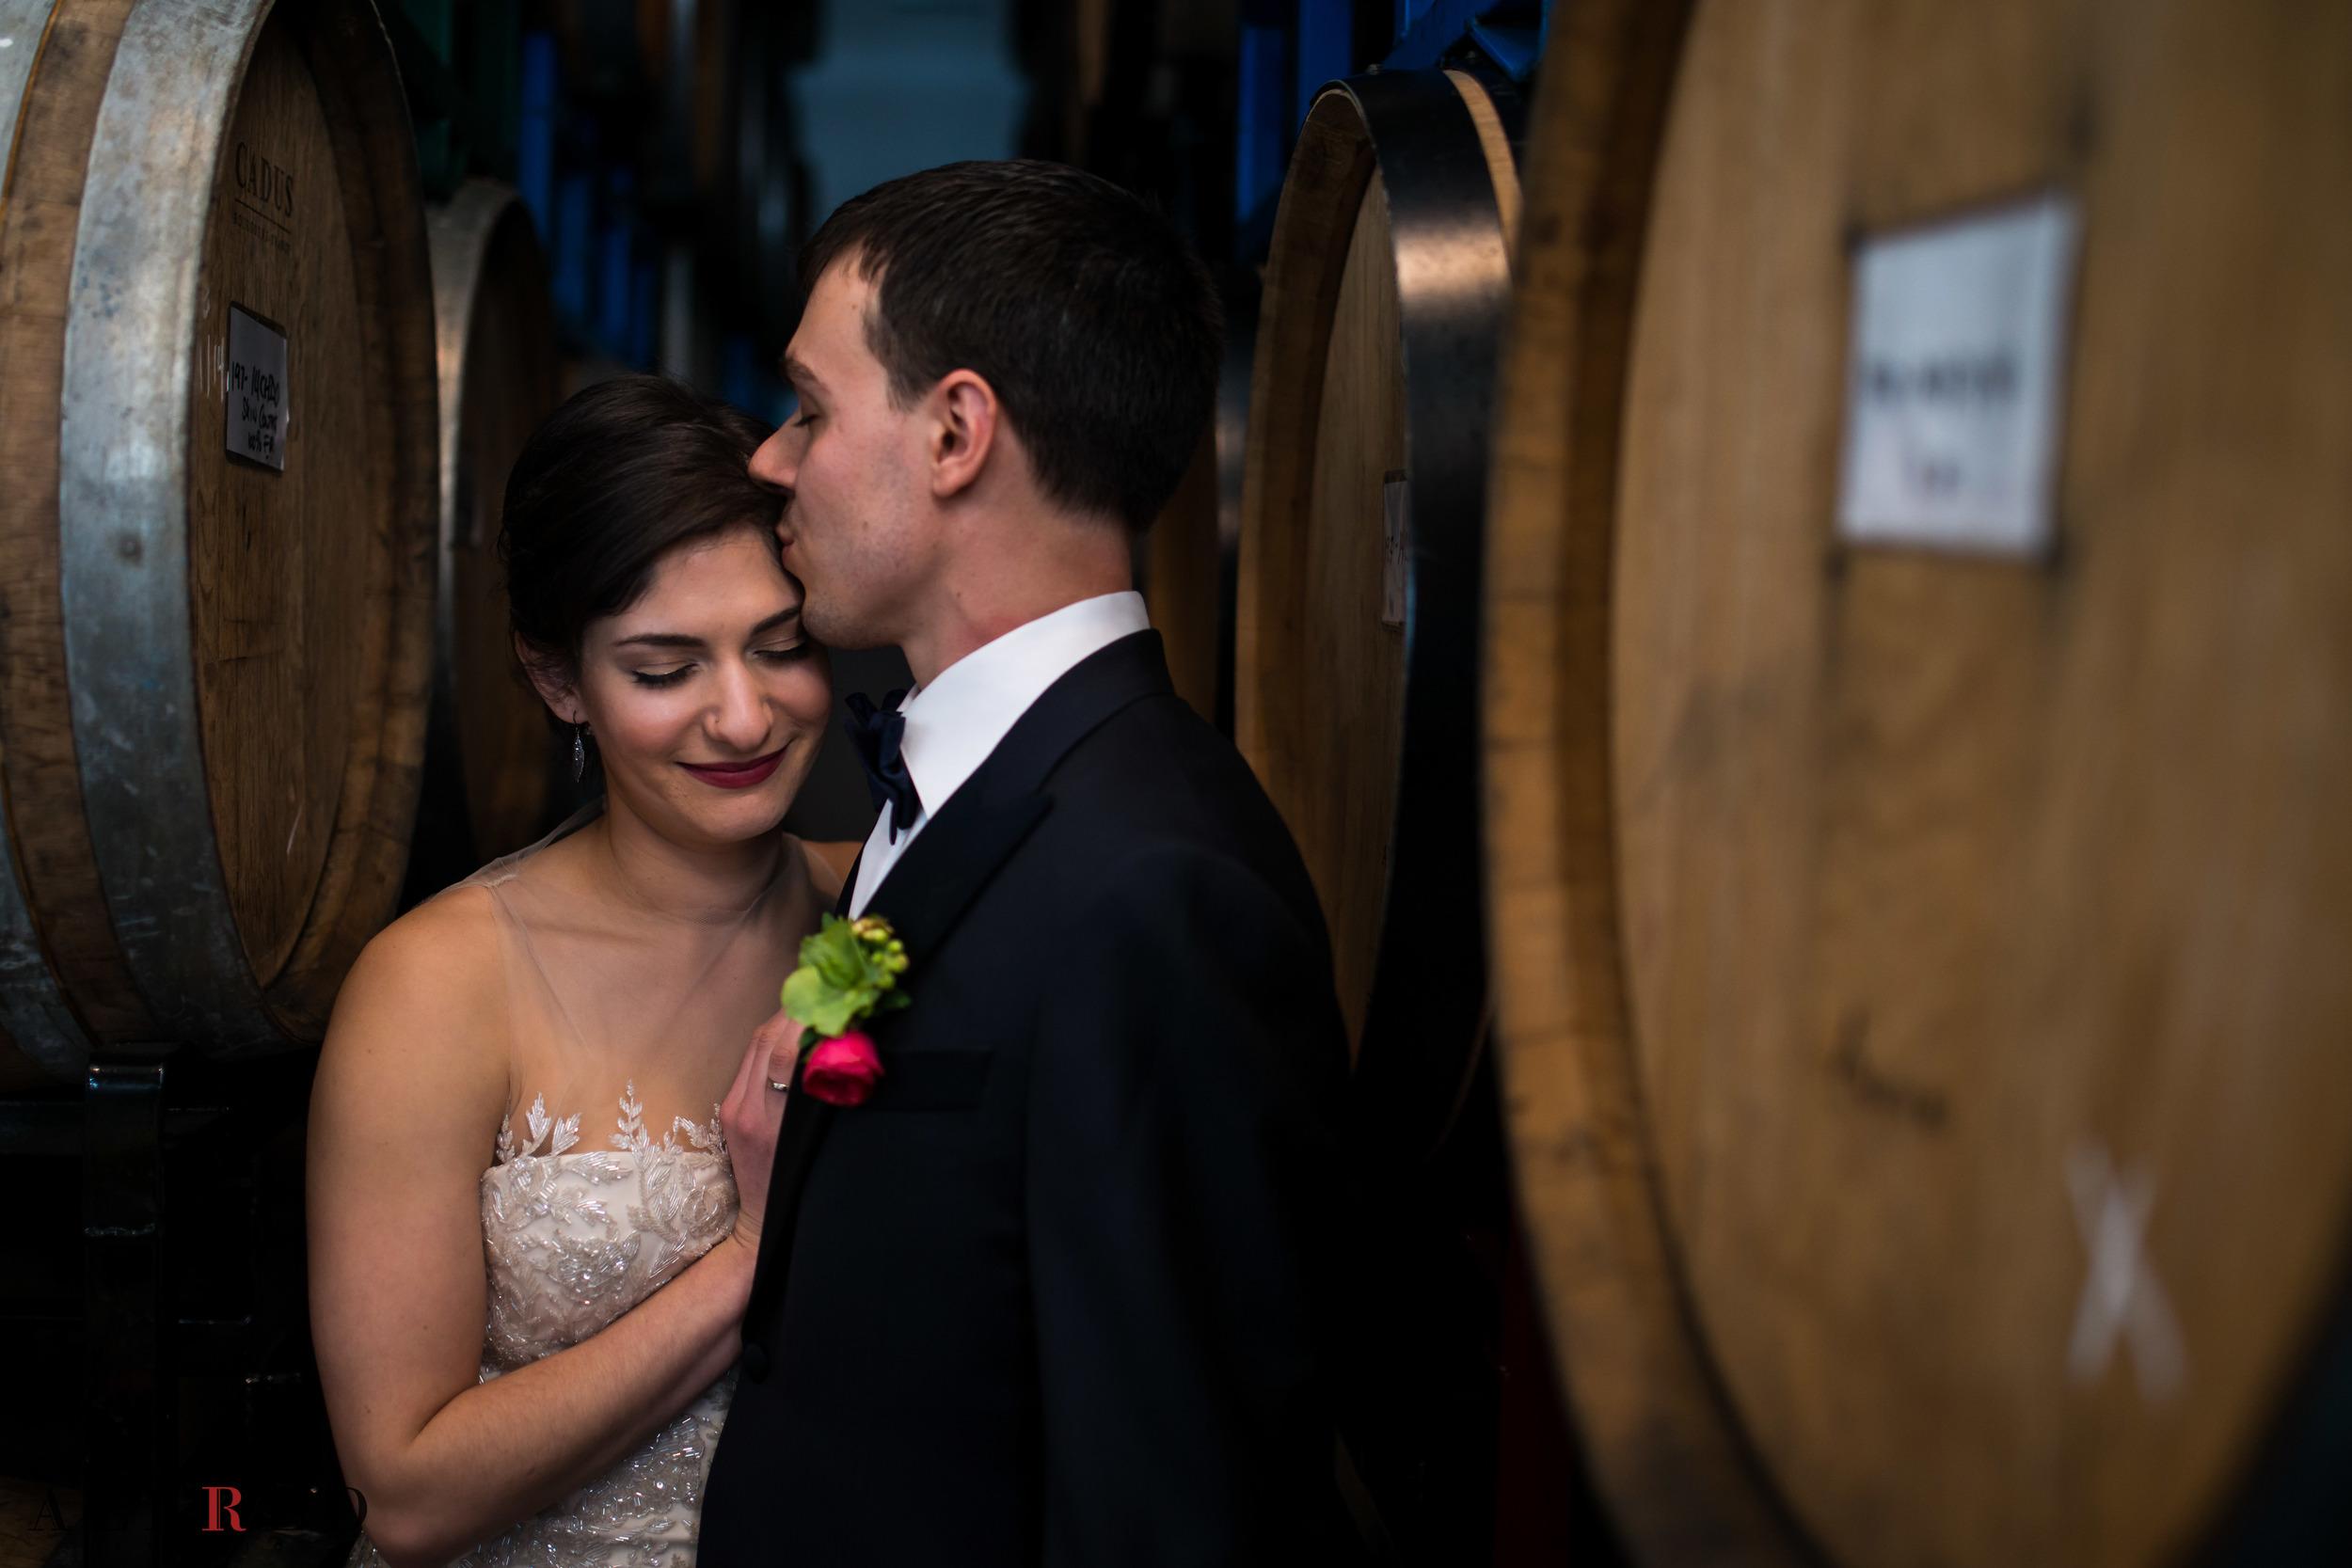 Wedding-Brooklyn-winery-allred-studio-new-york-photographer-new-jersey-hudson-valley-0033.jpg